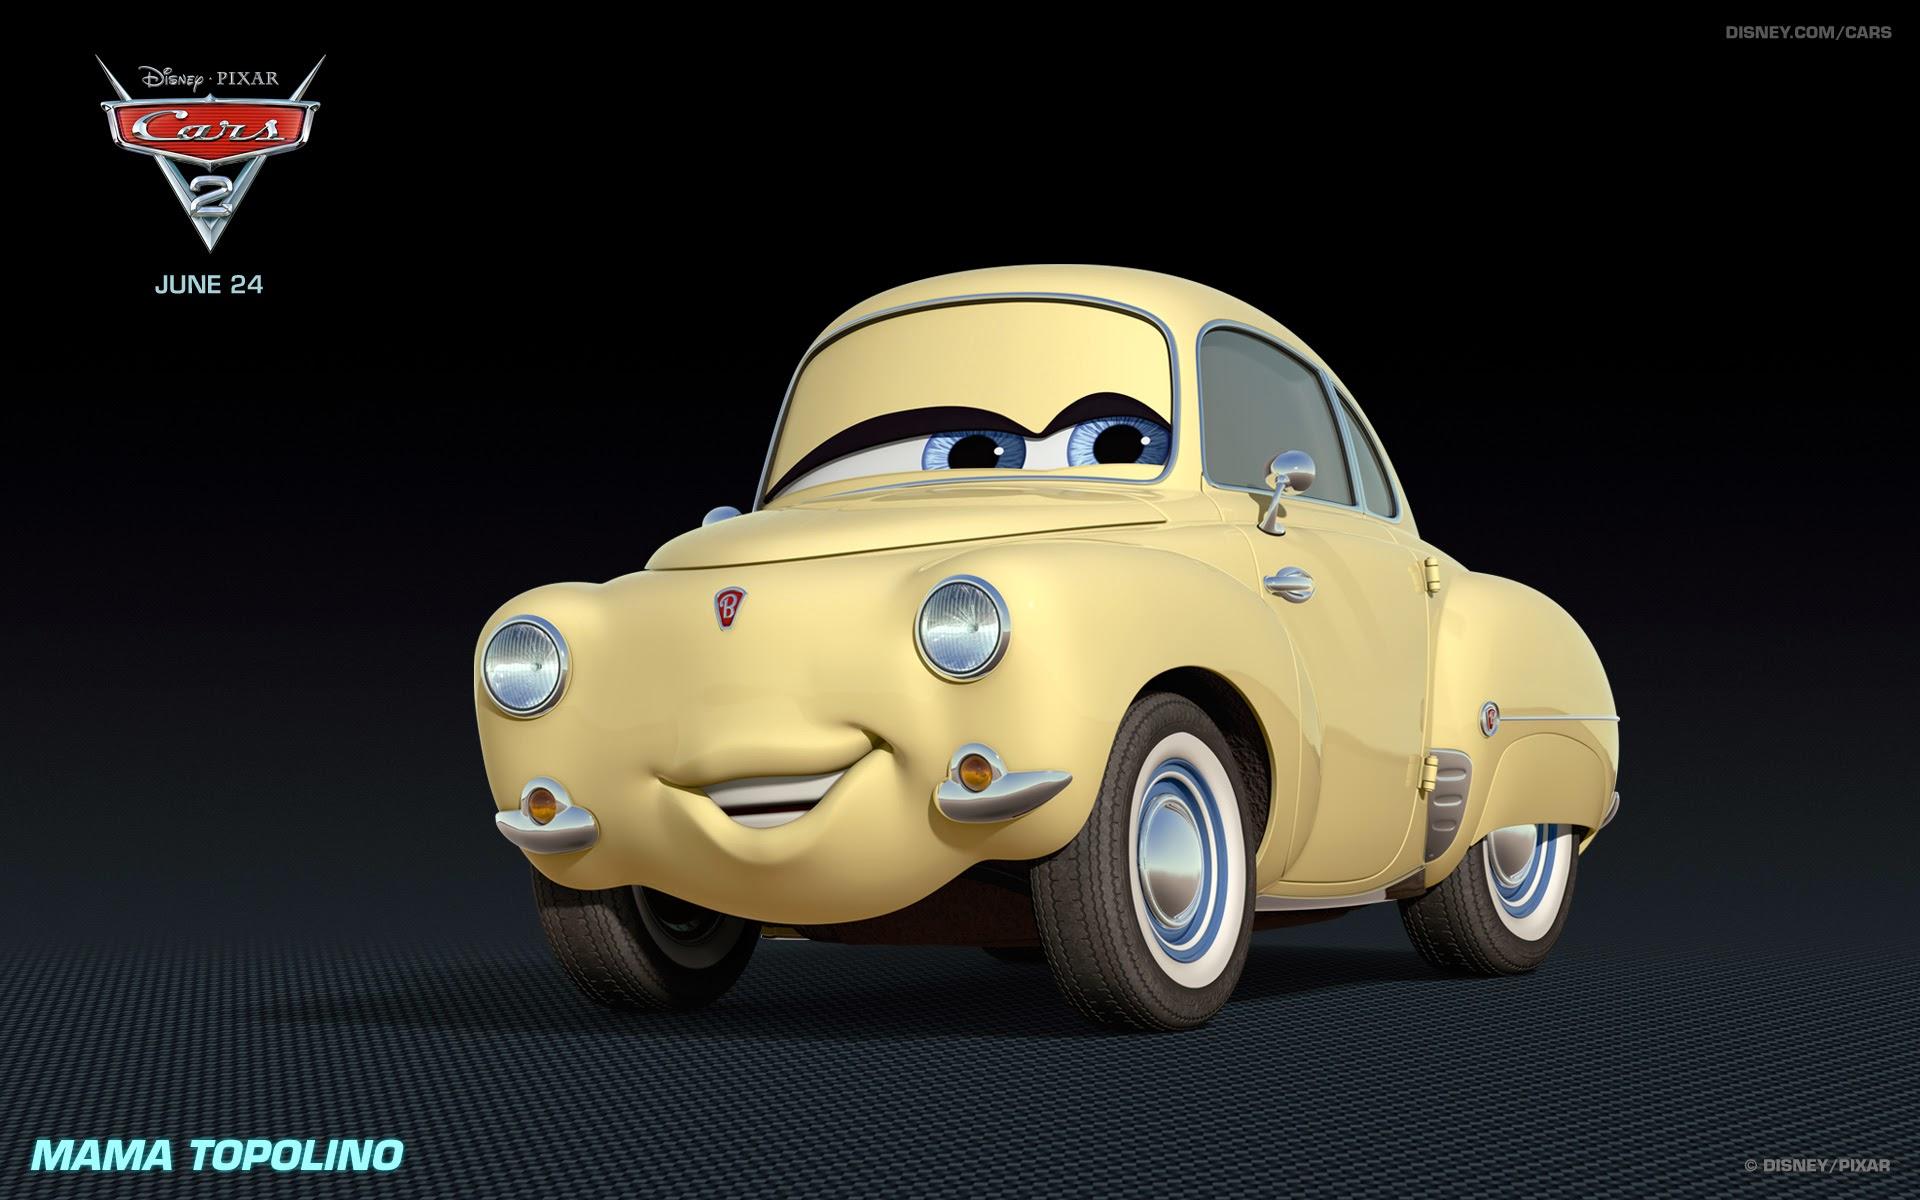 mama cars 2 2012 1920x1200